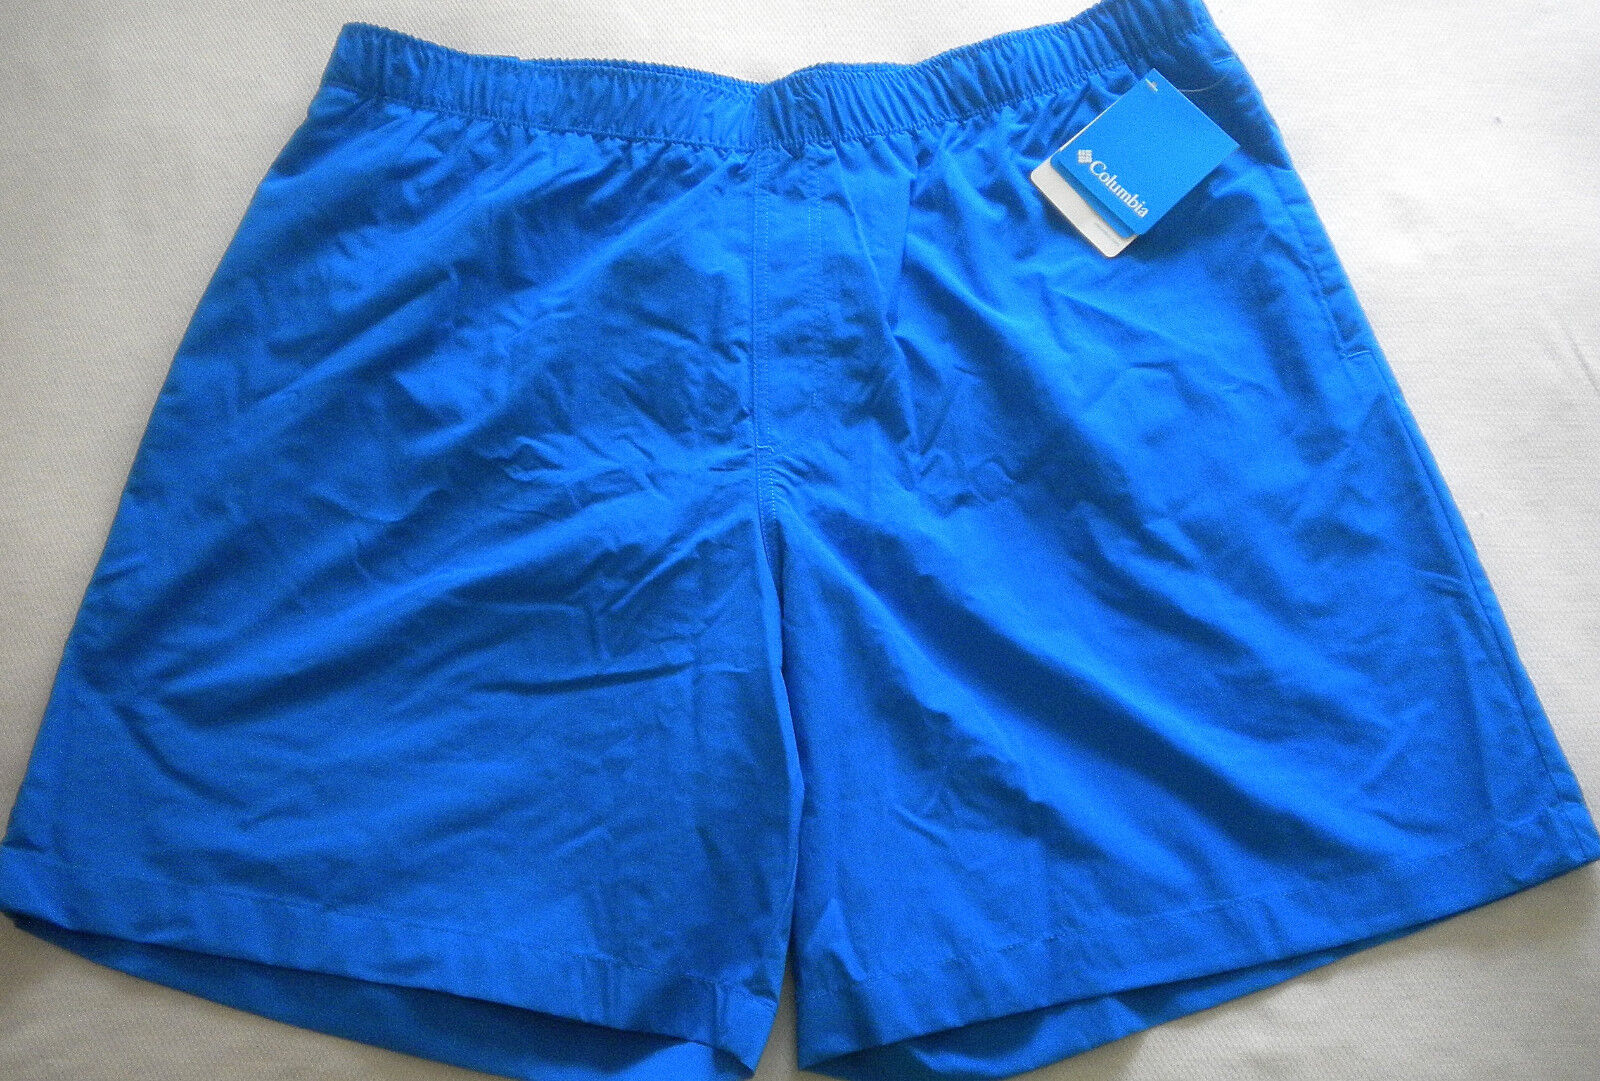 NWT  Men's COLUMBIA SWIM TRUNKS Gulf Breeze INNER BRIEF bluee XL